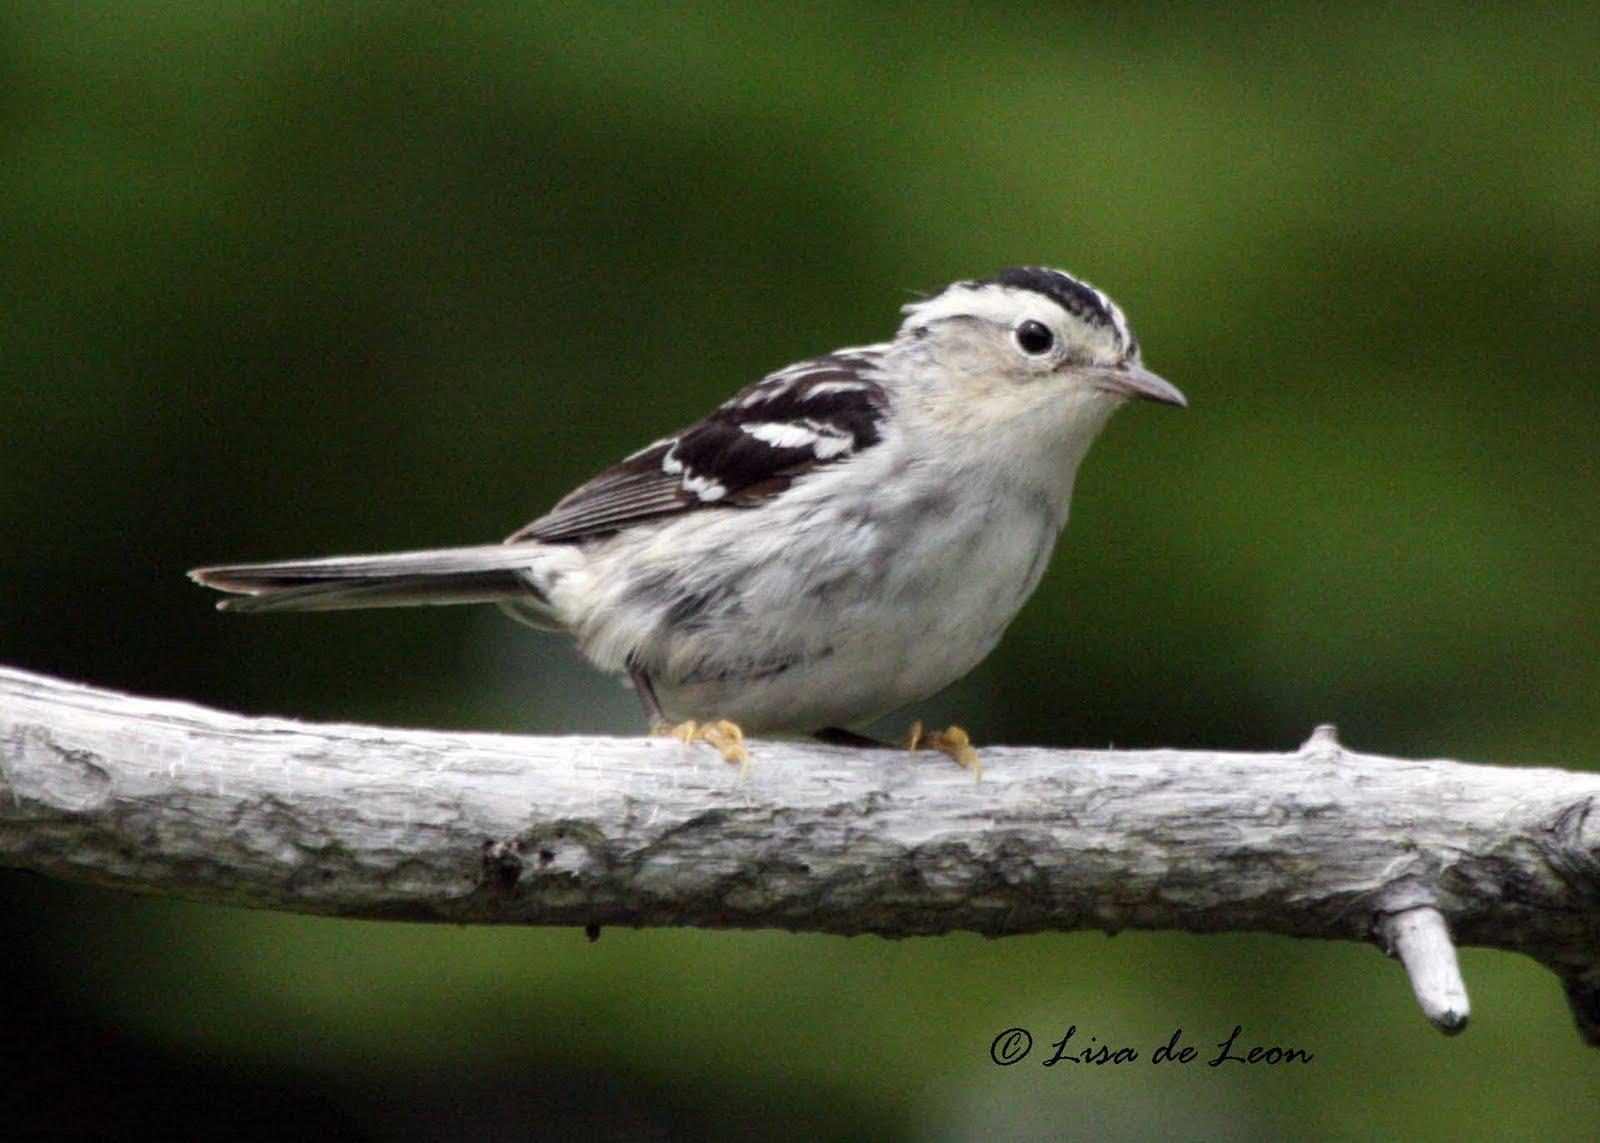 warbler female bird birds juvenile than birding leon lisa dazzling moments rare then there